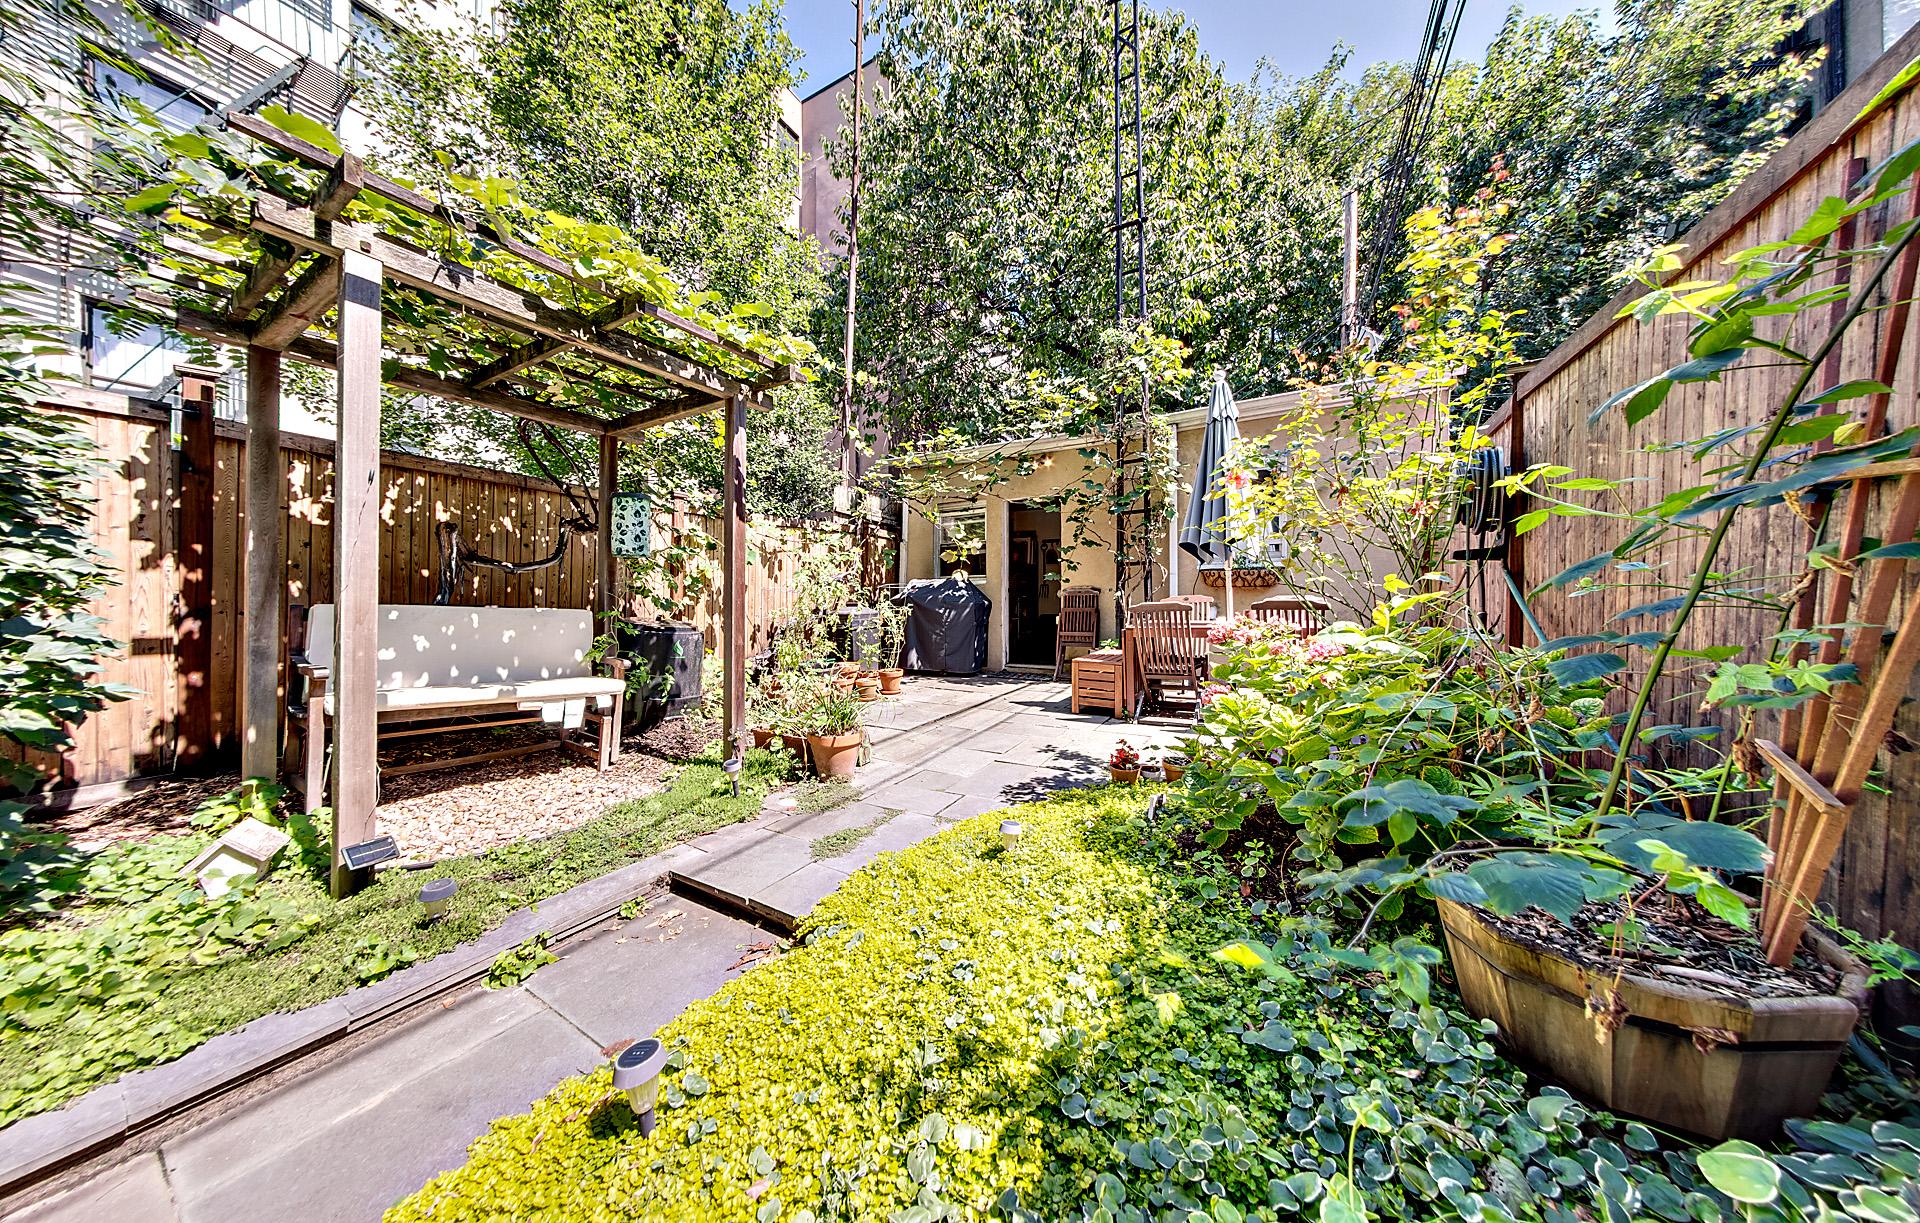 475 clinton street, 1 - $1,250,000 - Carroll Gardens